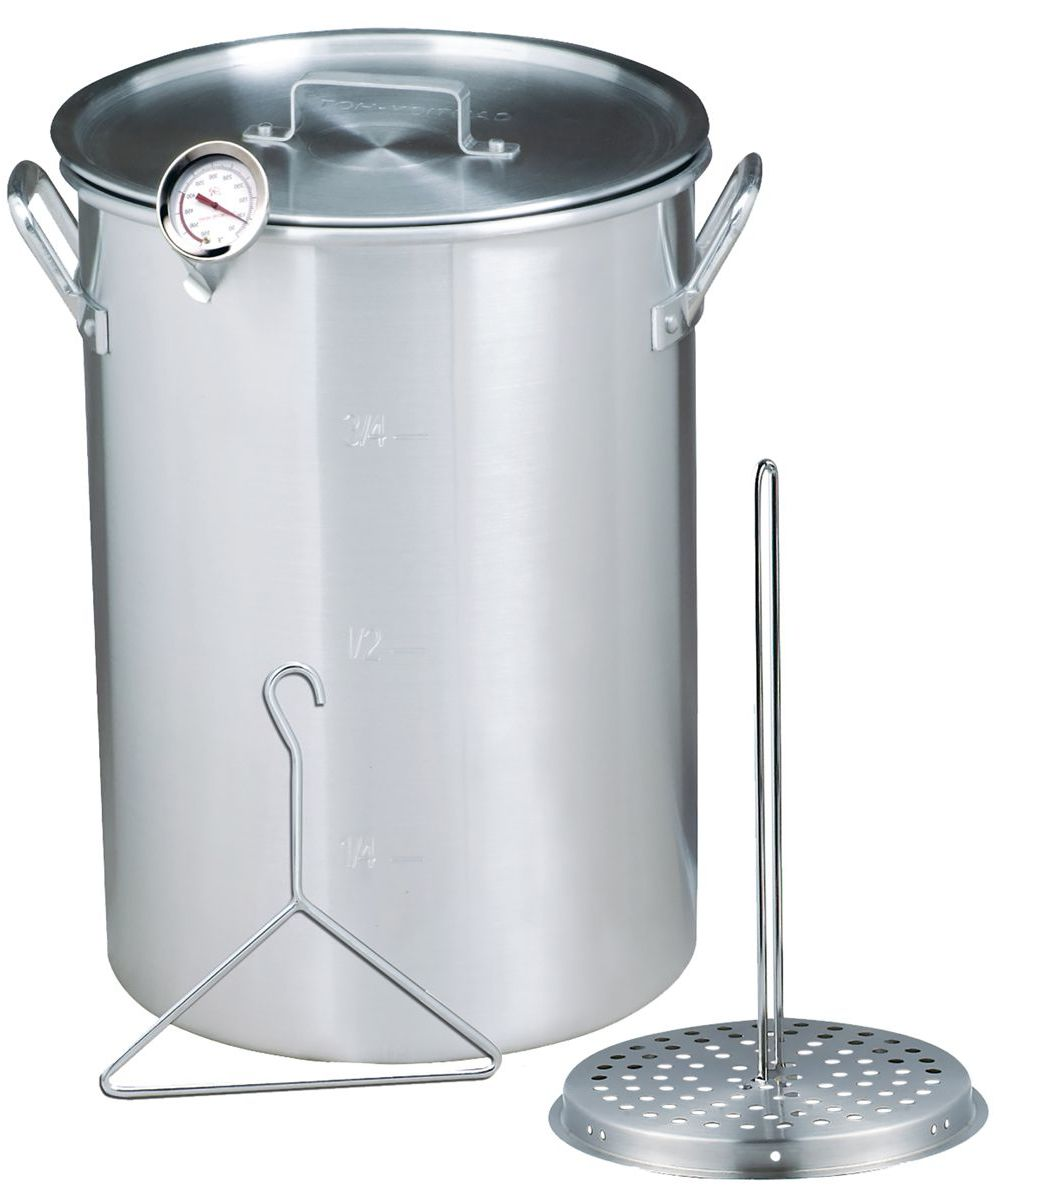 Bass Pro Shops Aluminum Pot With Turkey Rack